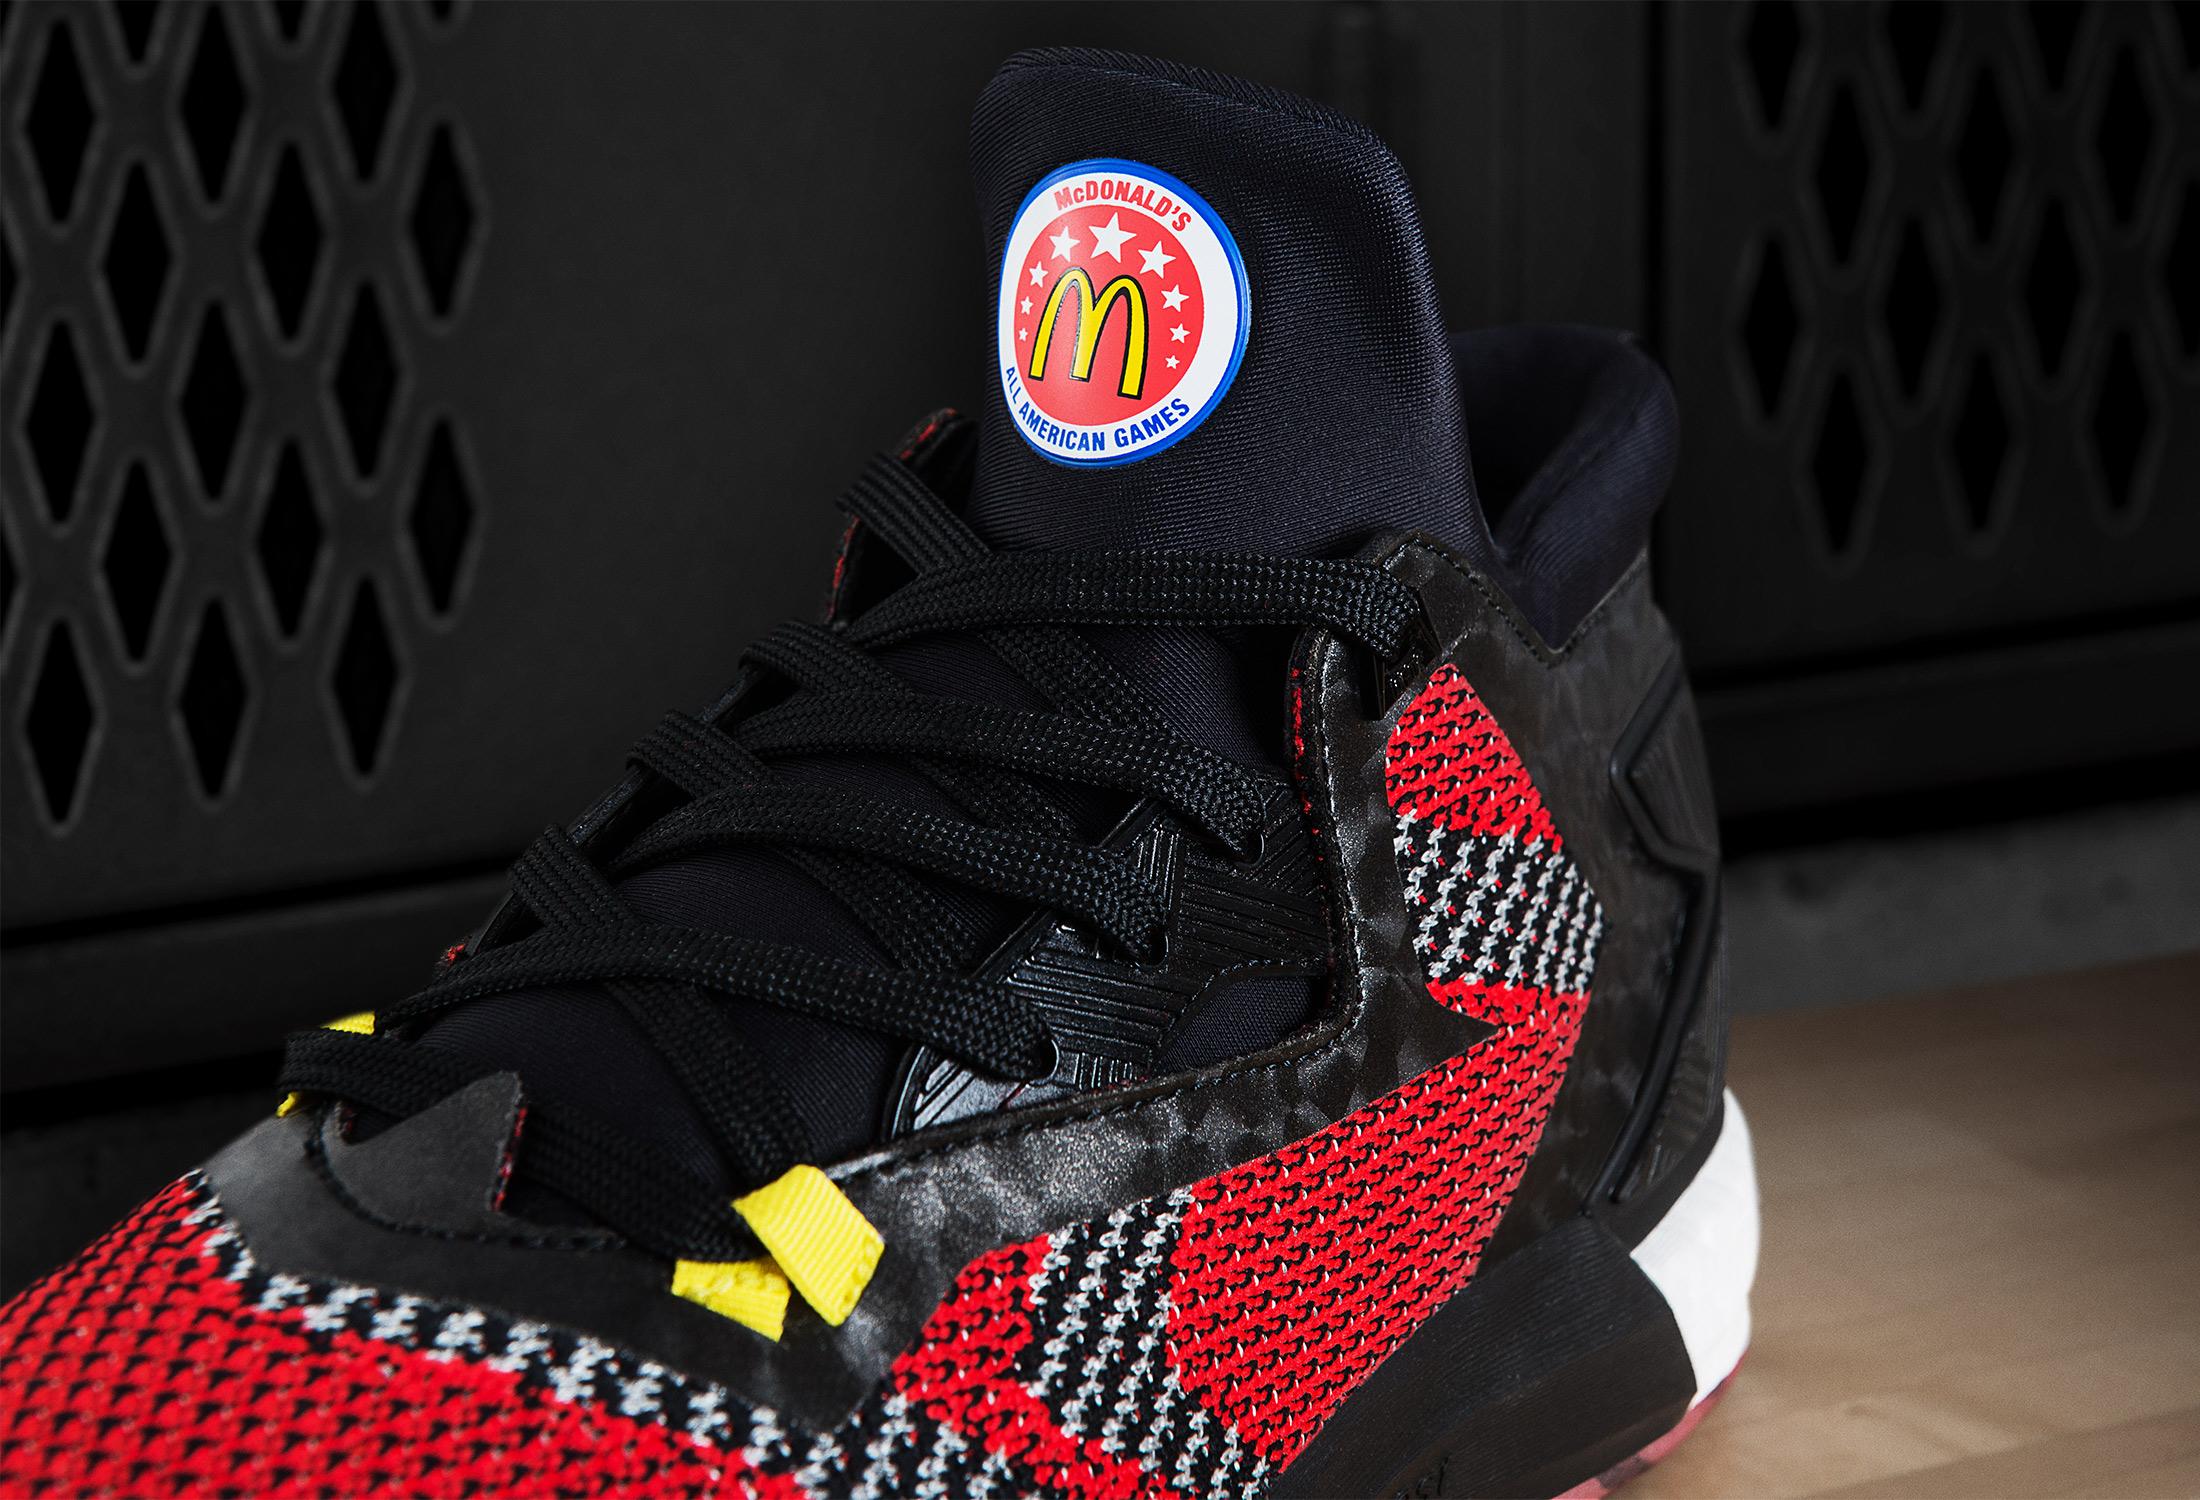 timeless design 1650d 00b8b ... Rose 5 Boost D Lillard 1 For The McDonalds All American adidas Unveils  Uniform Collection for 2016 McDonald¹s All American Games-3 ...